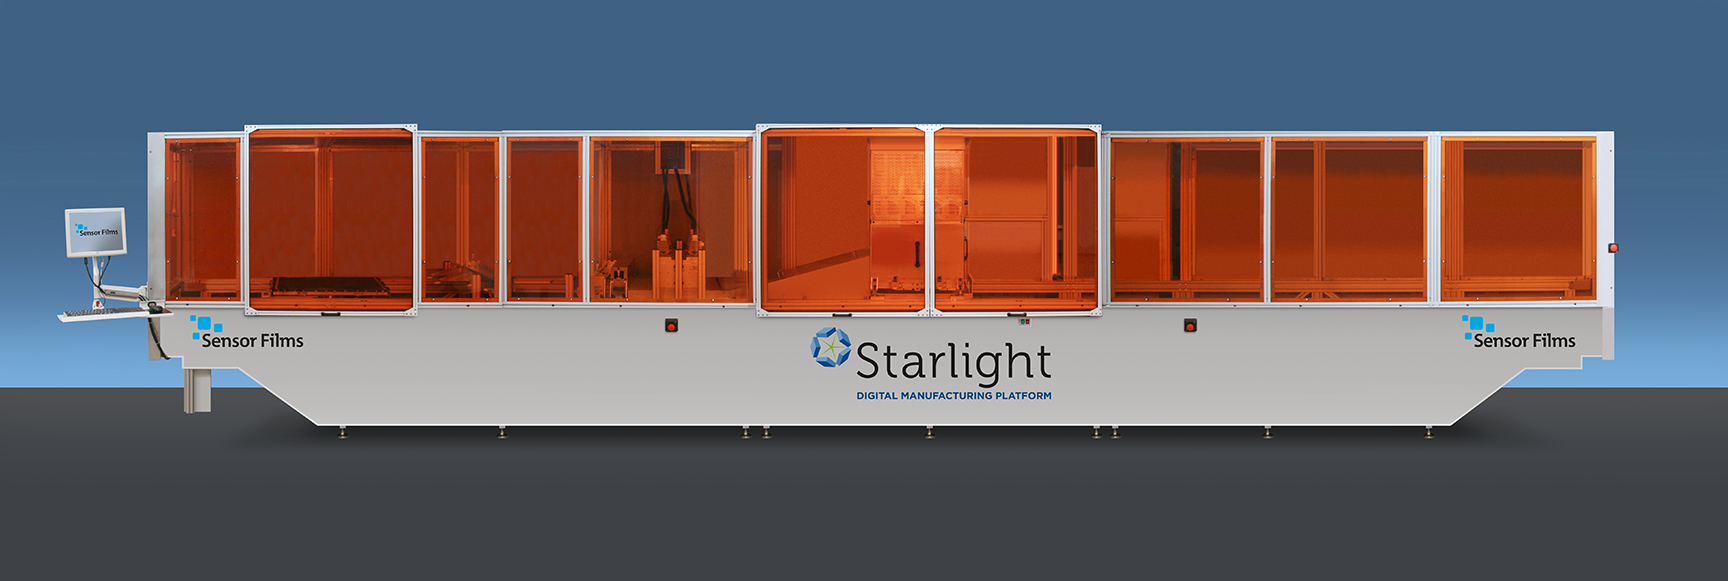 Sensor Films Starlight industrial Inkjet Technology will be shown at InPrint USA